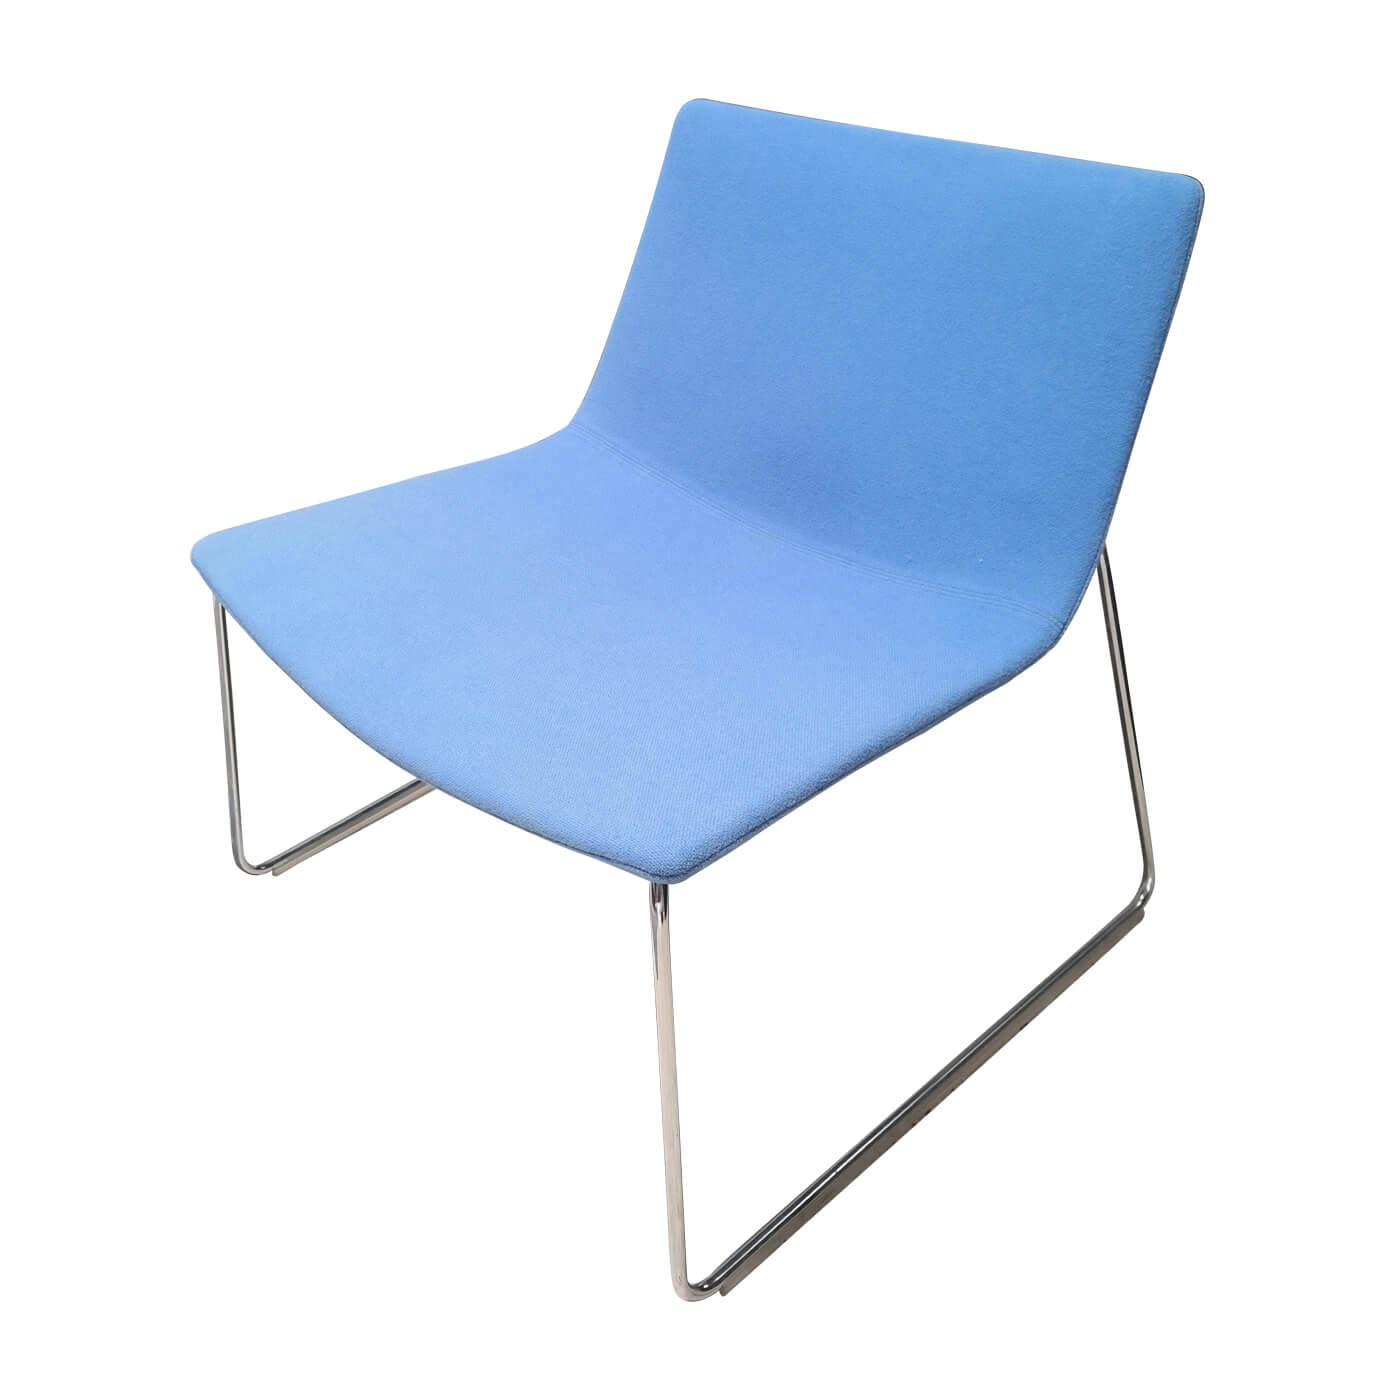 Arper Catifa 60 chair in blue, second hand